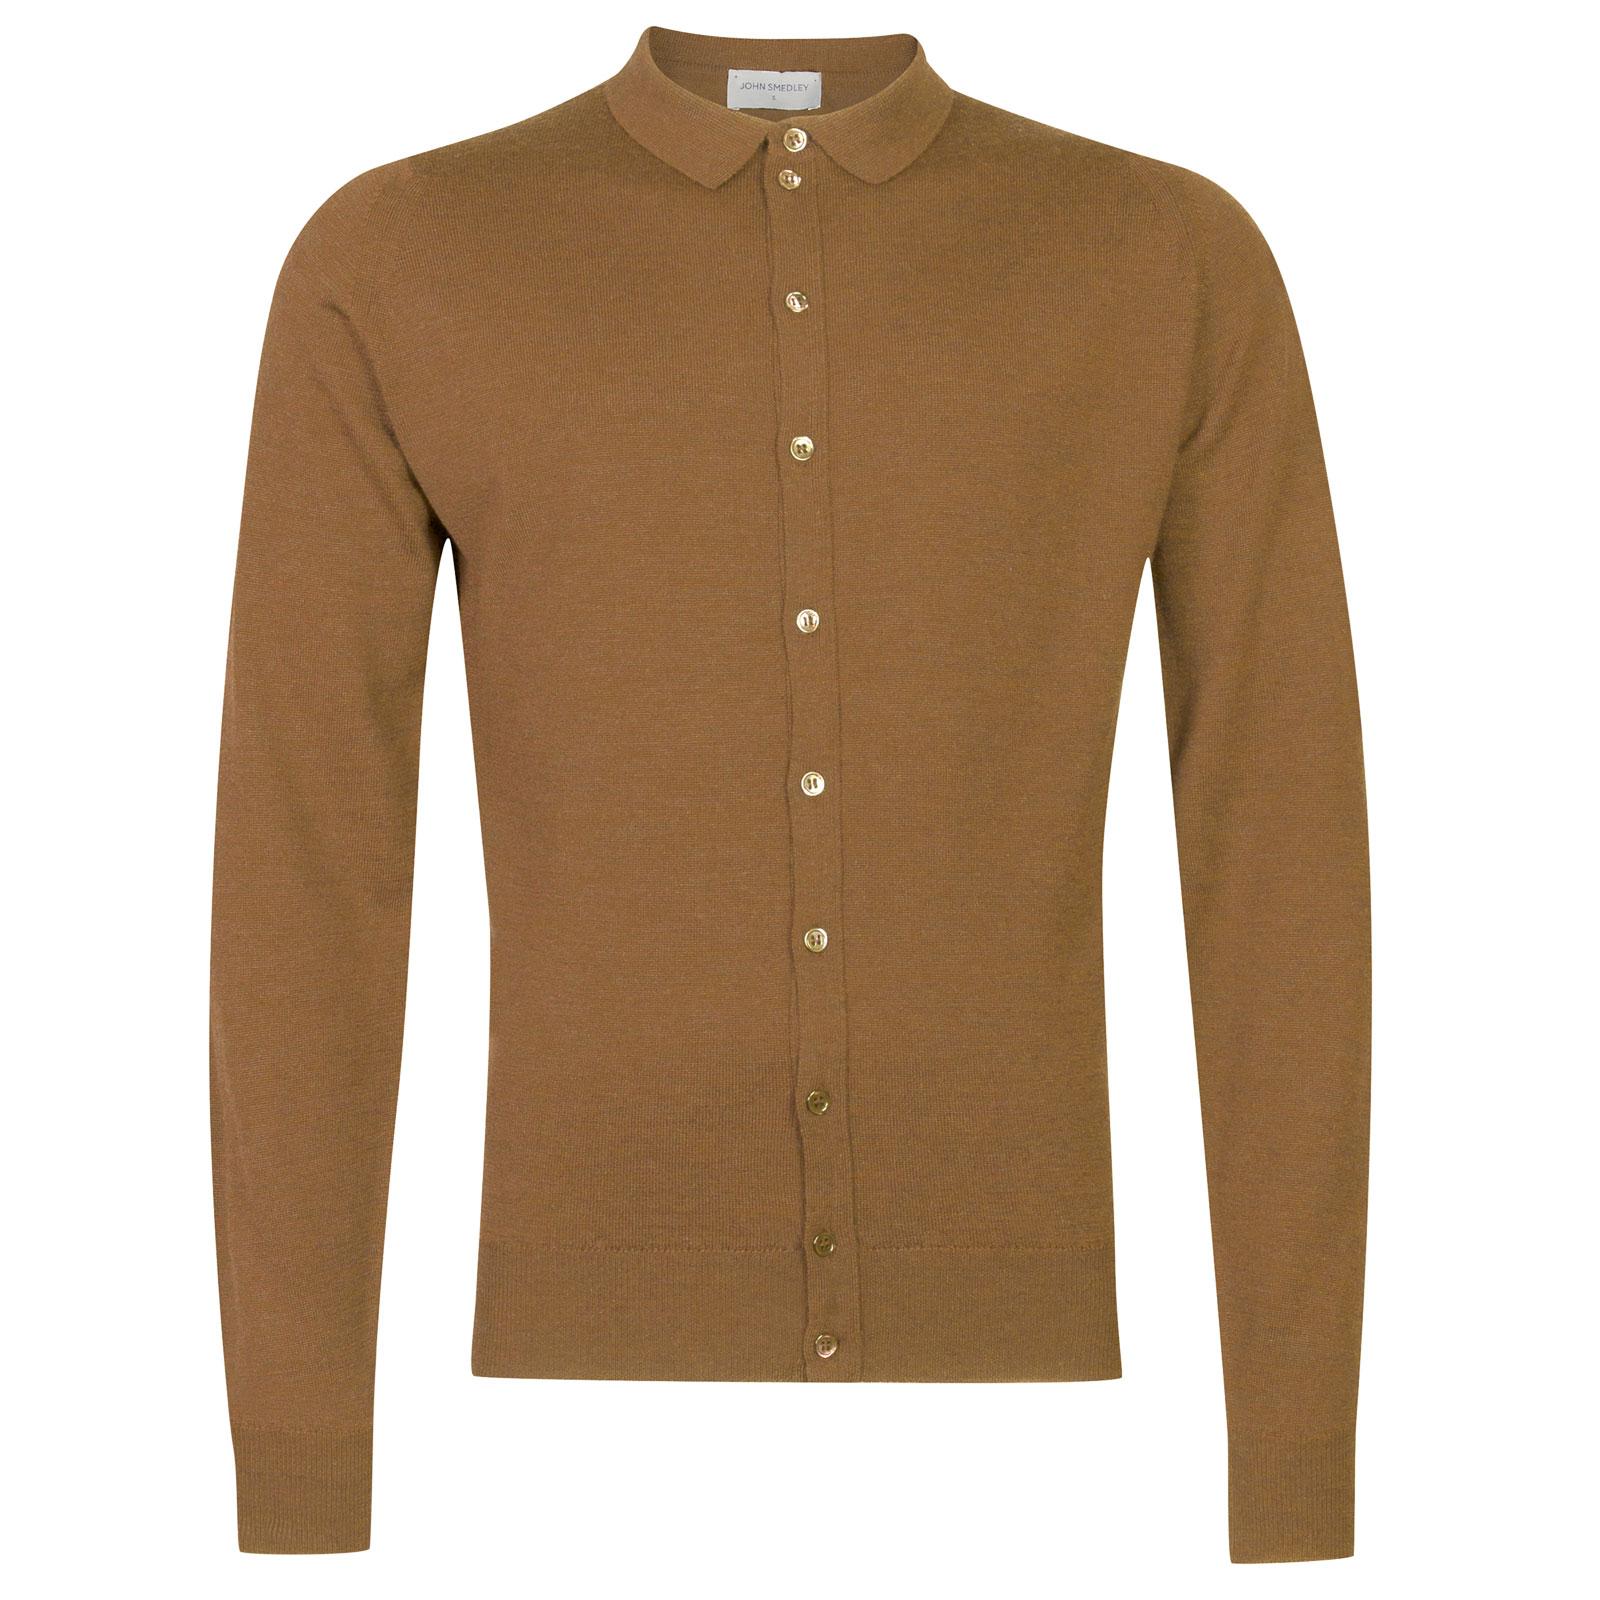 John Smedley parwish Merino Wool Shirt in Camel-M